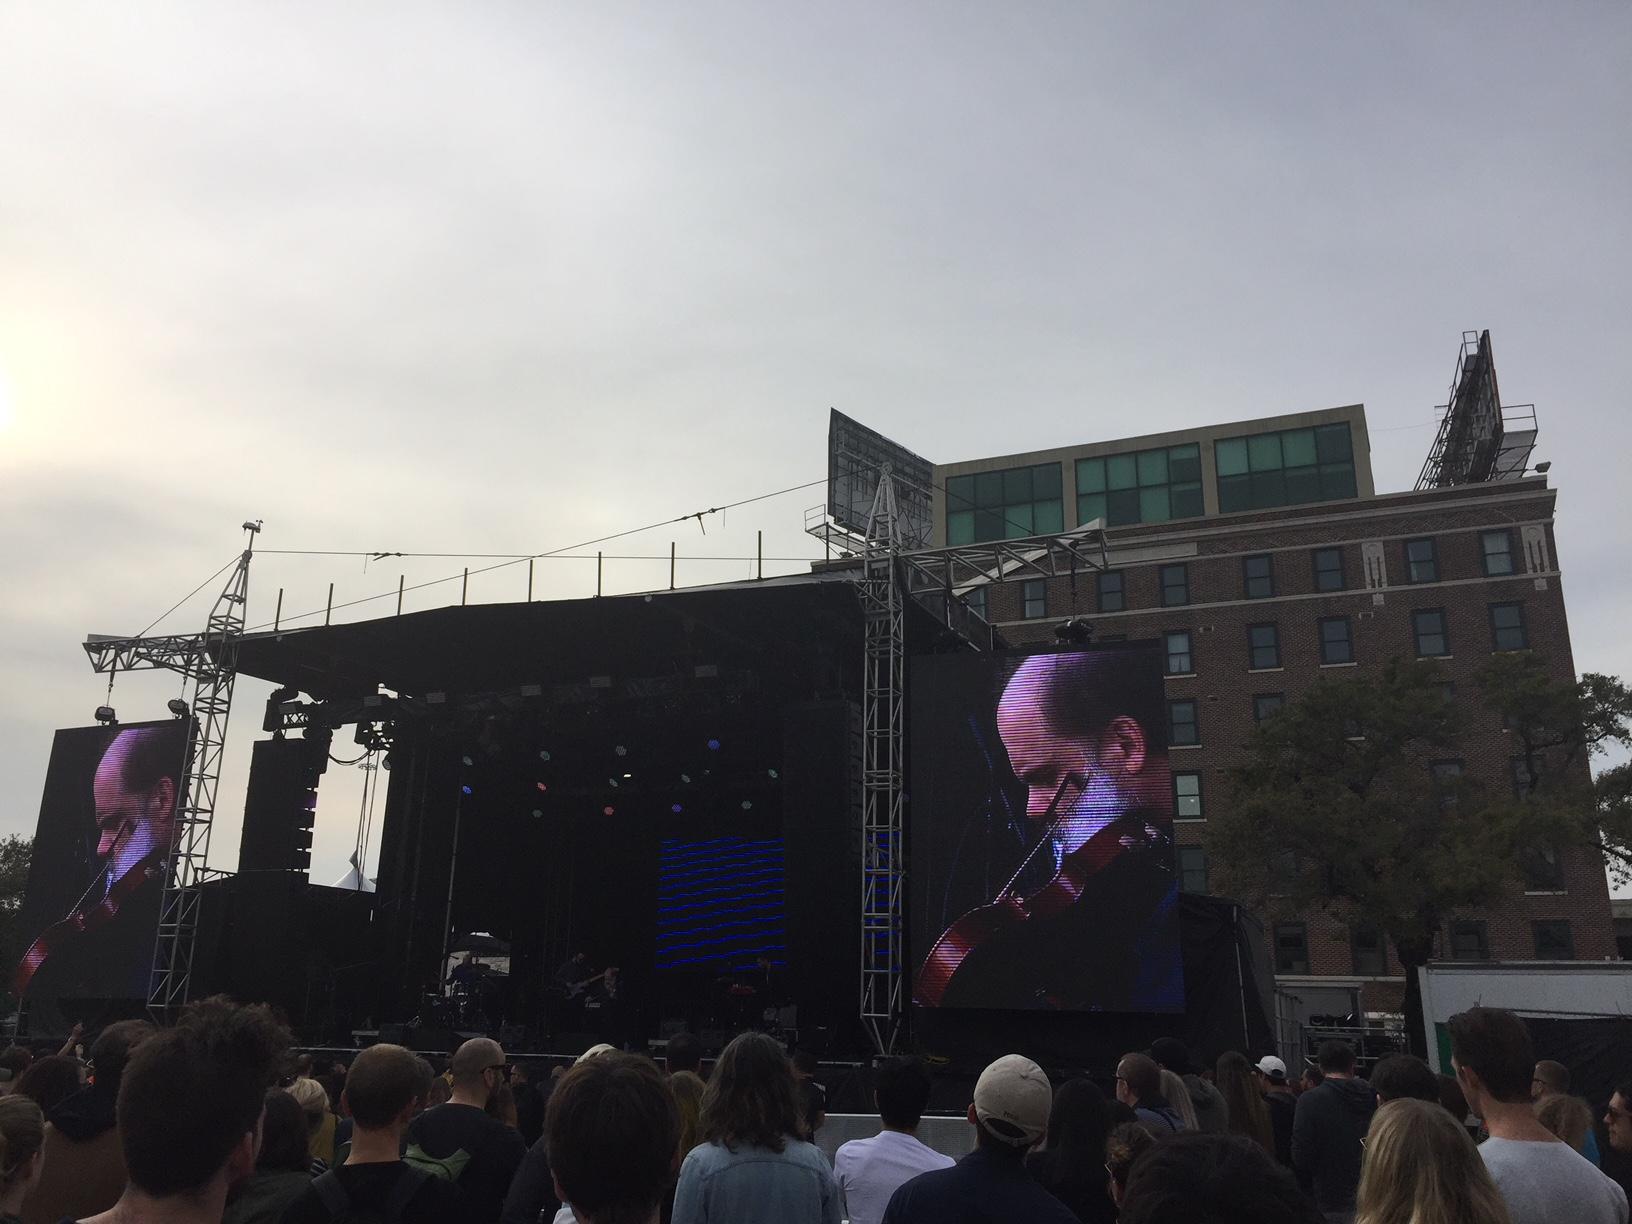 HIGH NOTES: A Music Festival, Post-Ayahuasca - Audiofemme